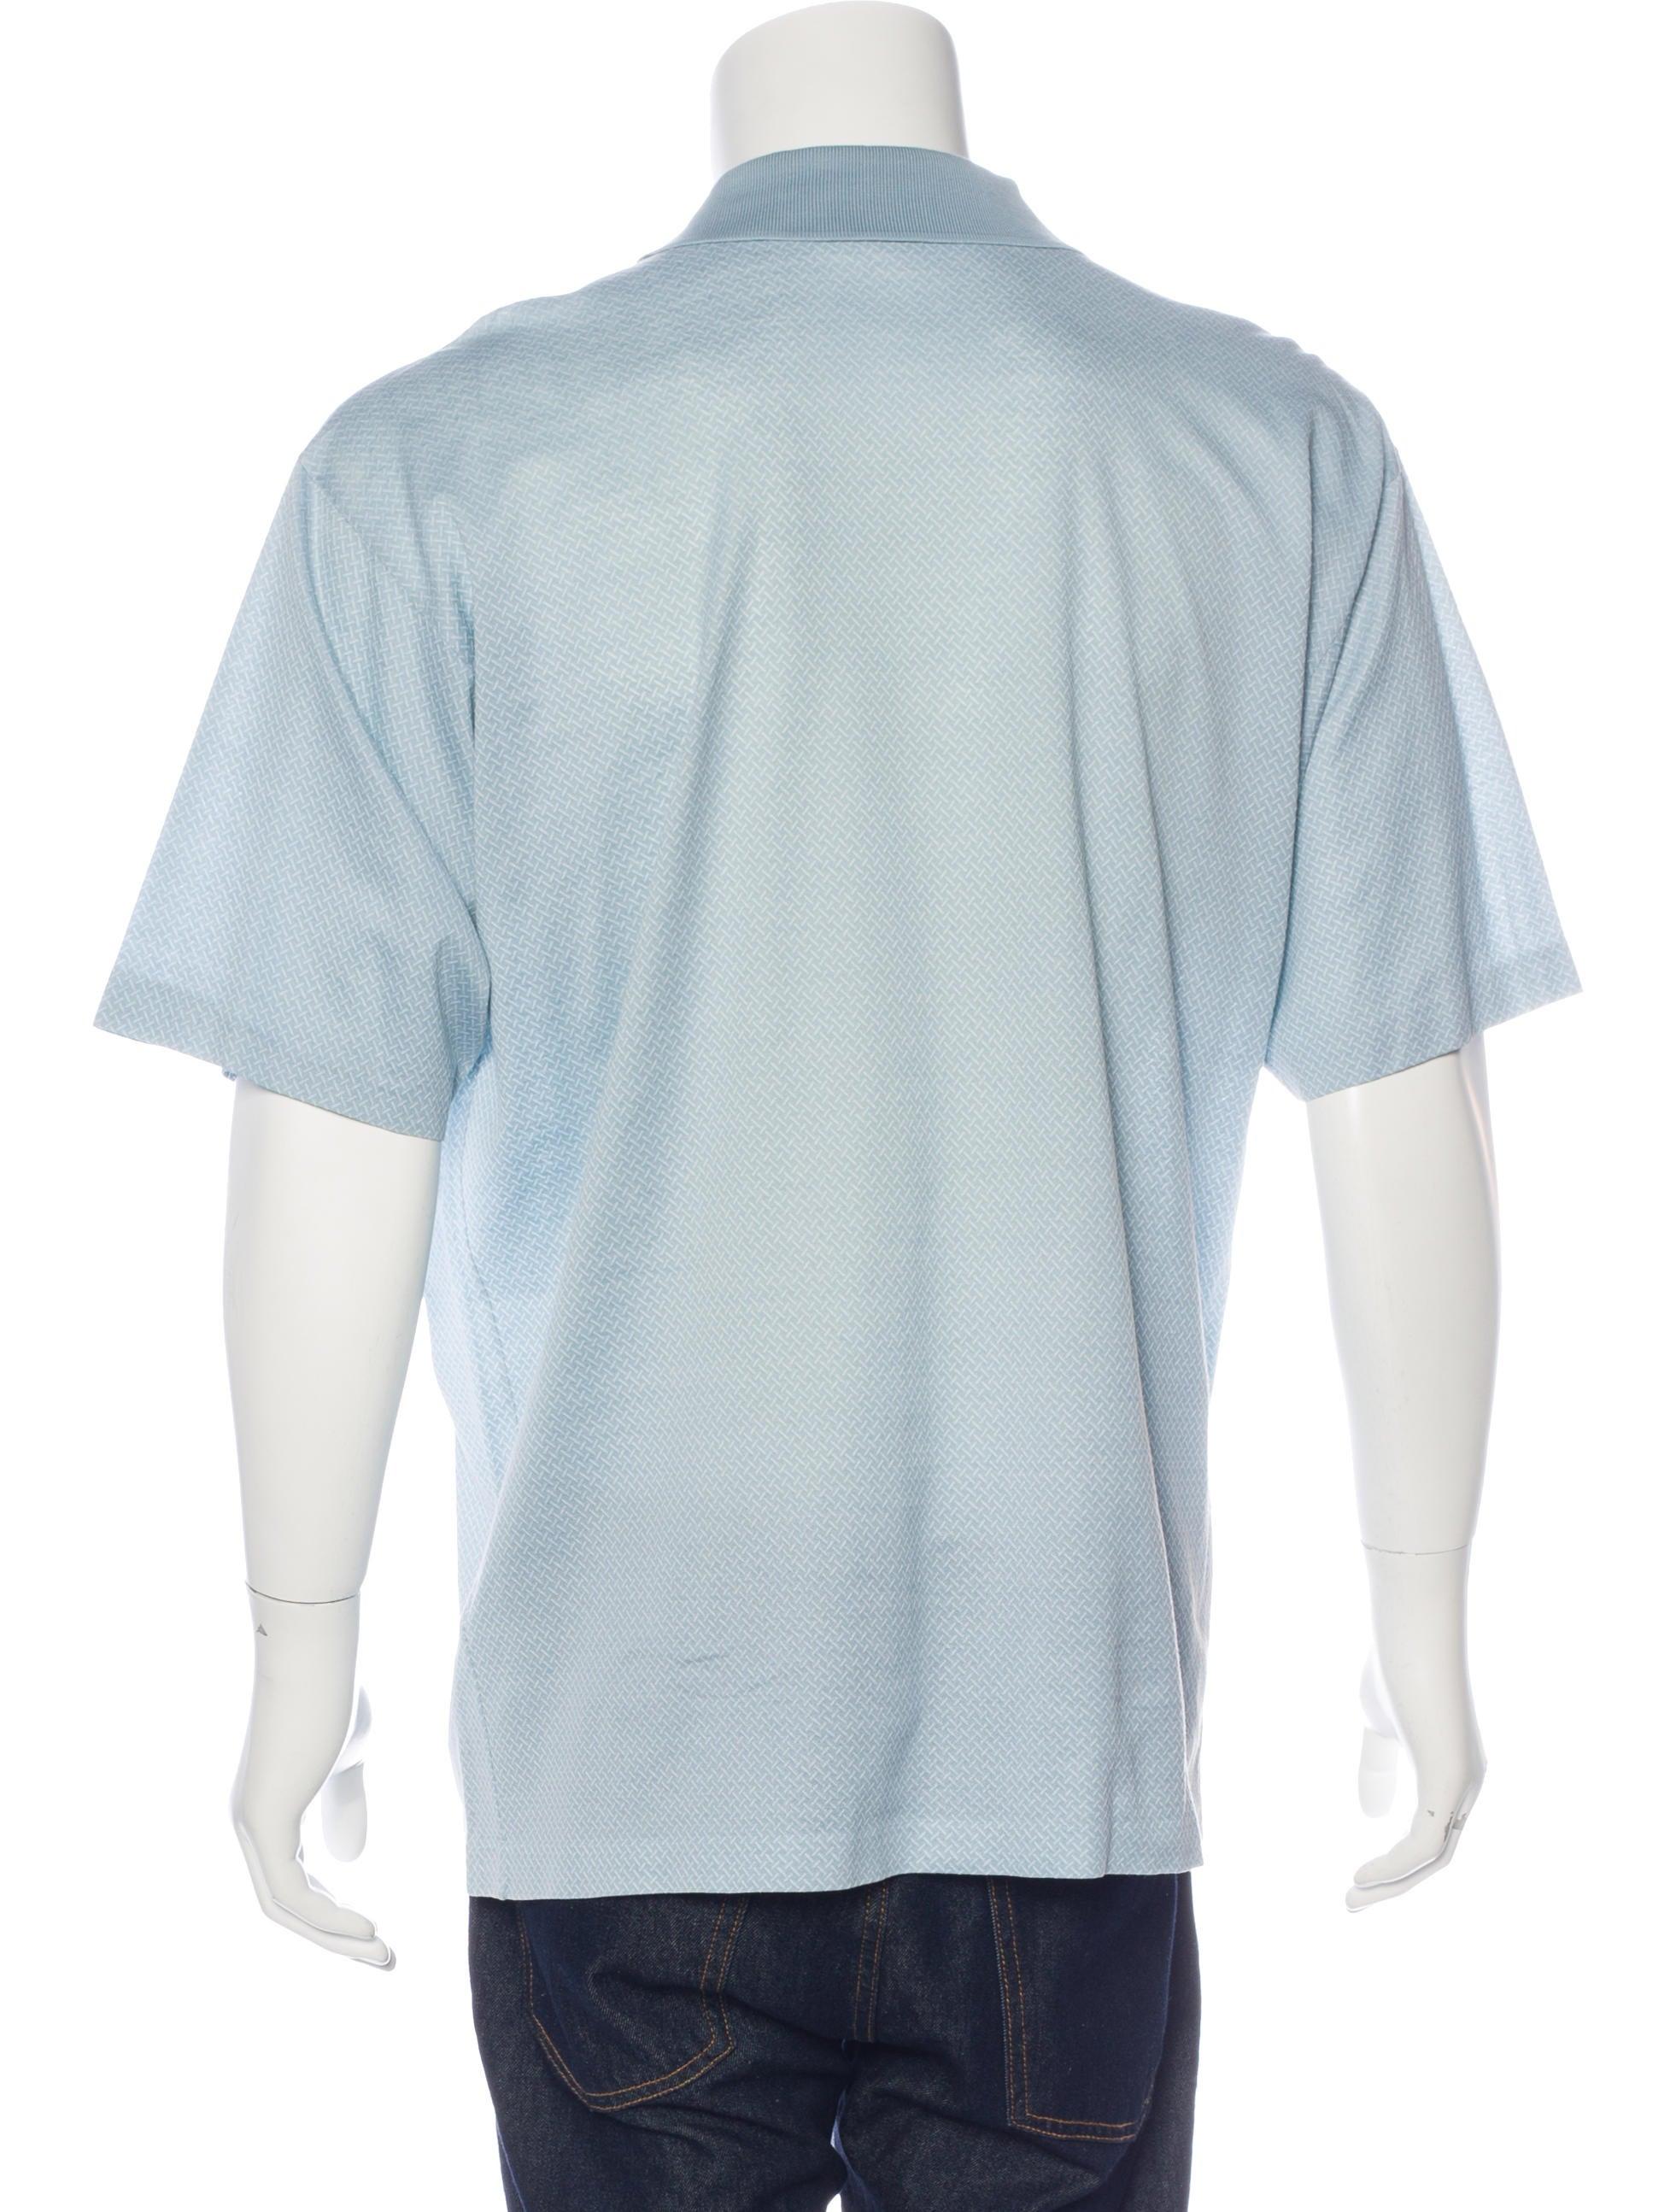 Ermenegildo zegna printed polo shirt clothing zgn24970 for Zegna polo shirts sale